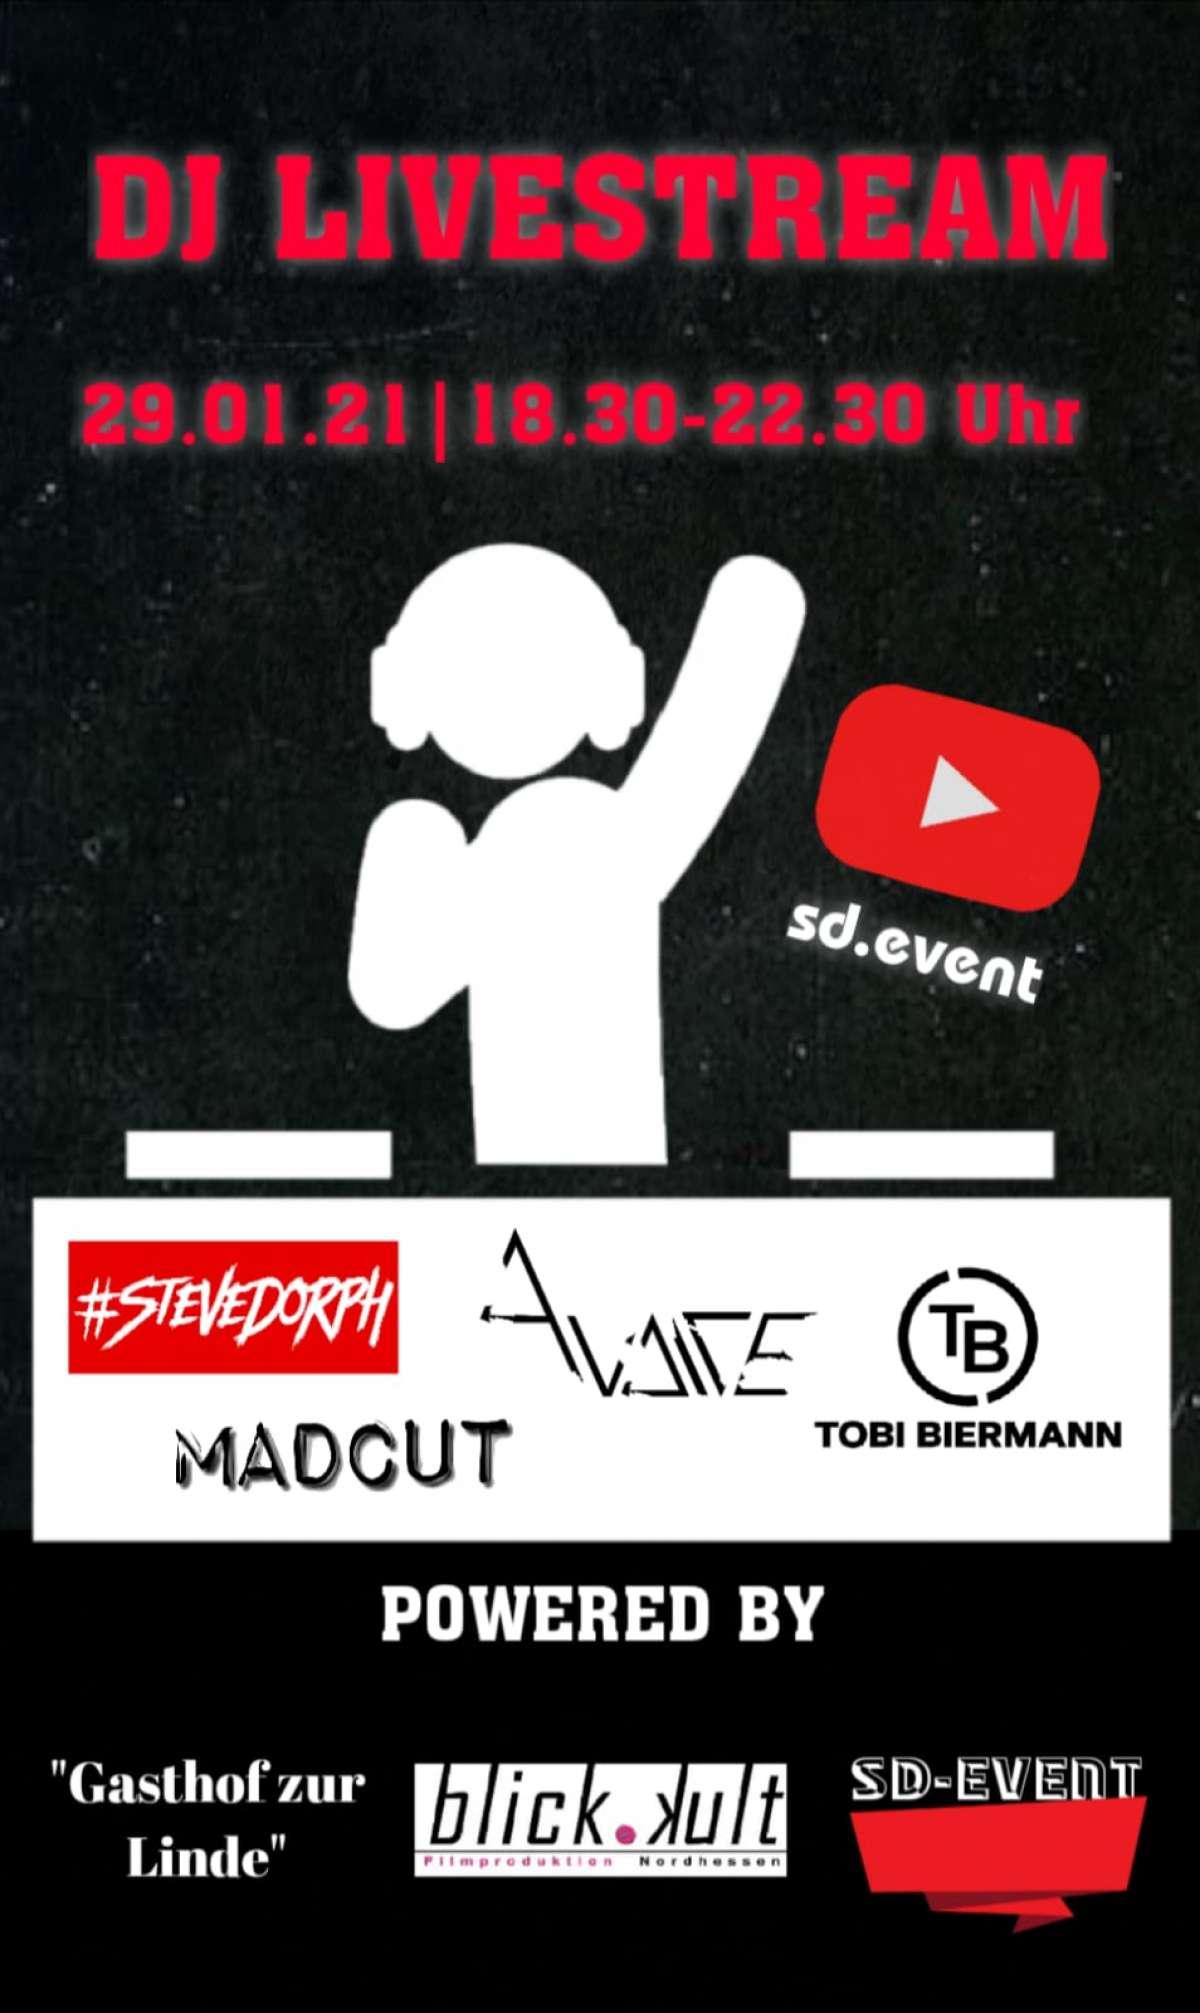 DJ-Livestream - Steve Dorph, Tobi Biermann, Avaice, Madcut - Internet - Weltweit Online